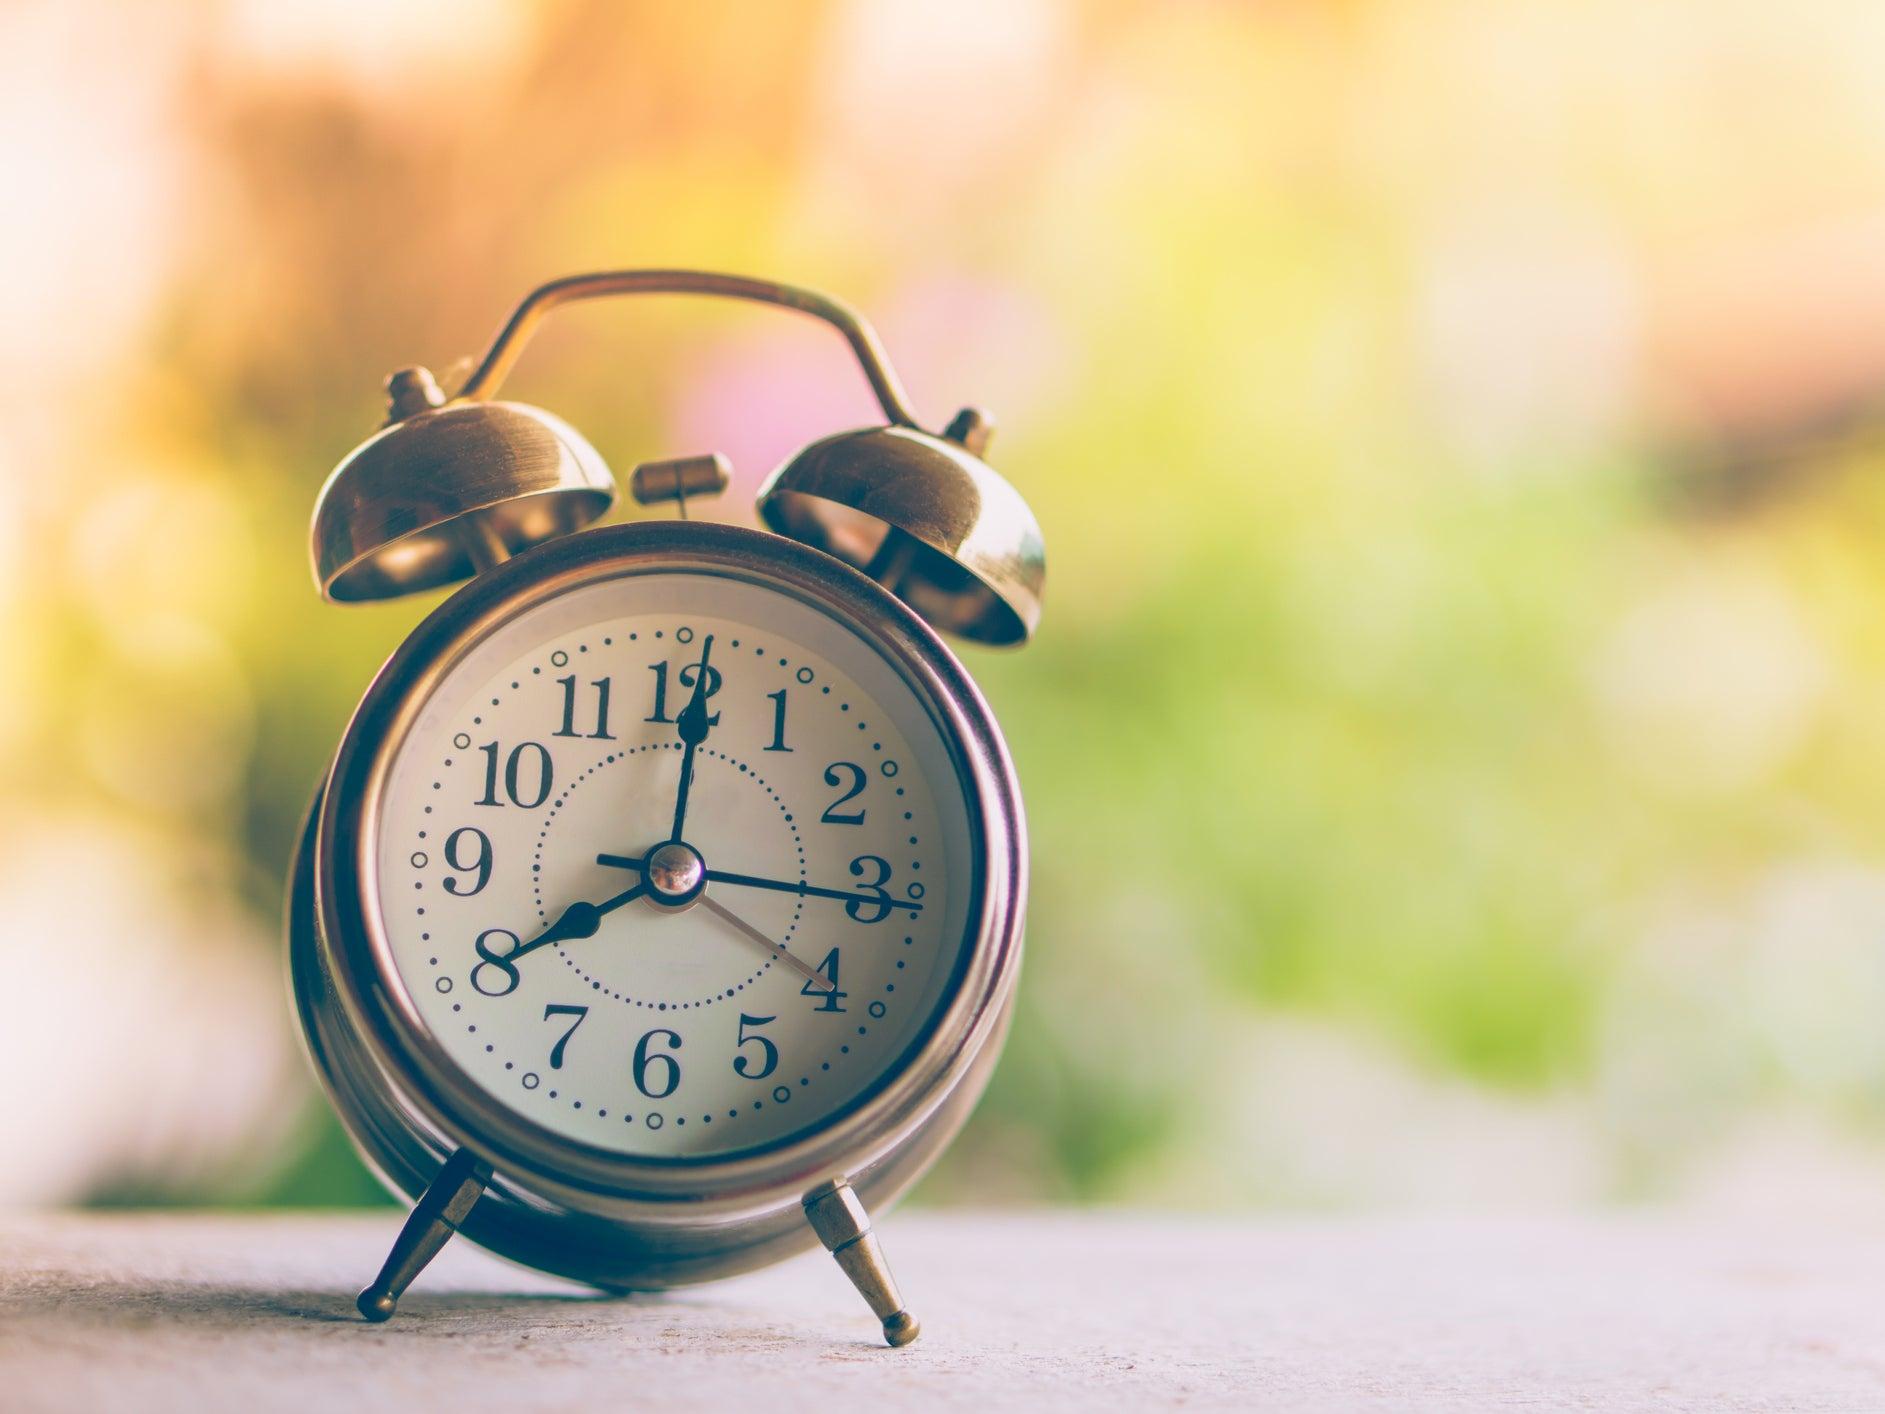 Daylight Saving Time UK 2019: Why did the clocks go forward